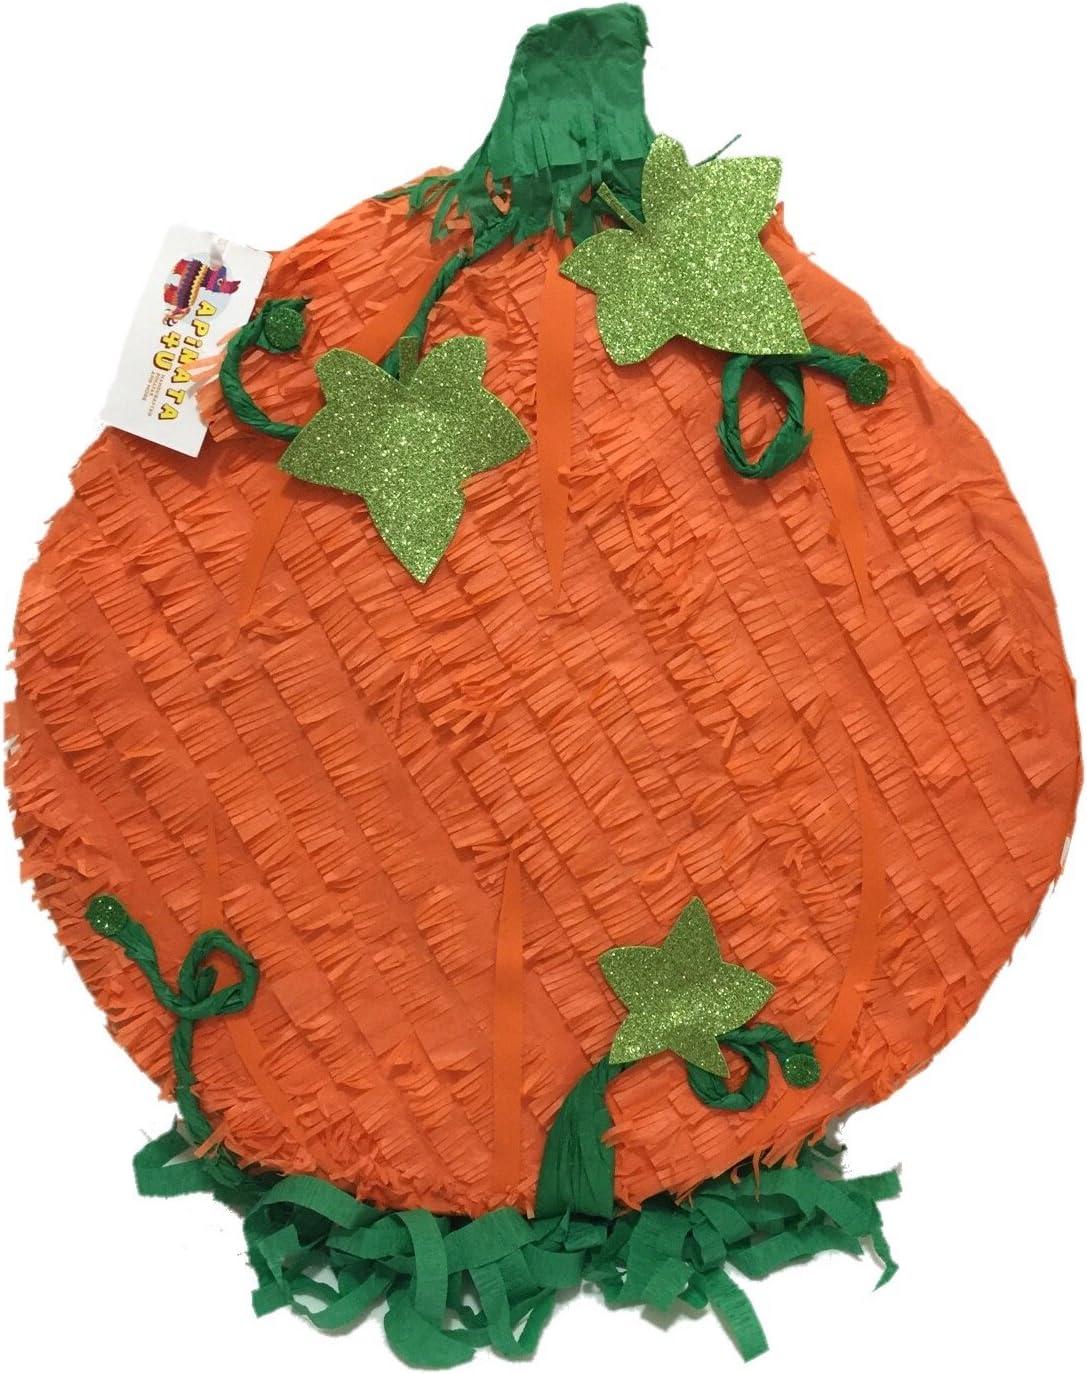 APINATA4U Fall Theme Pumpkin National products Pinata latest